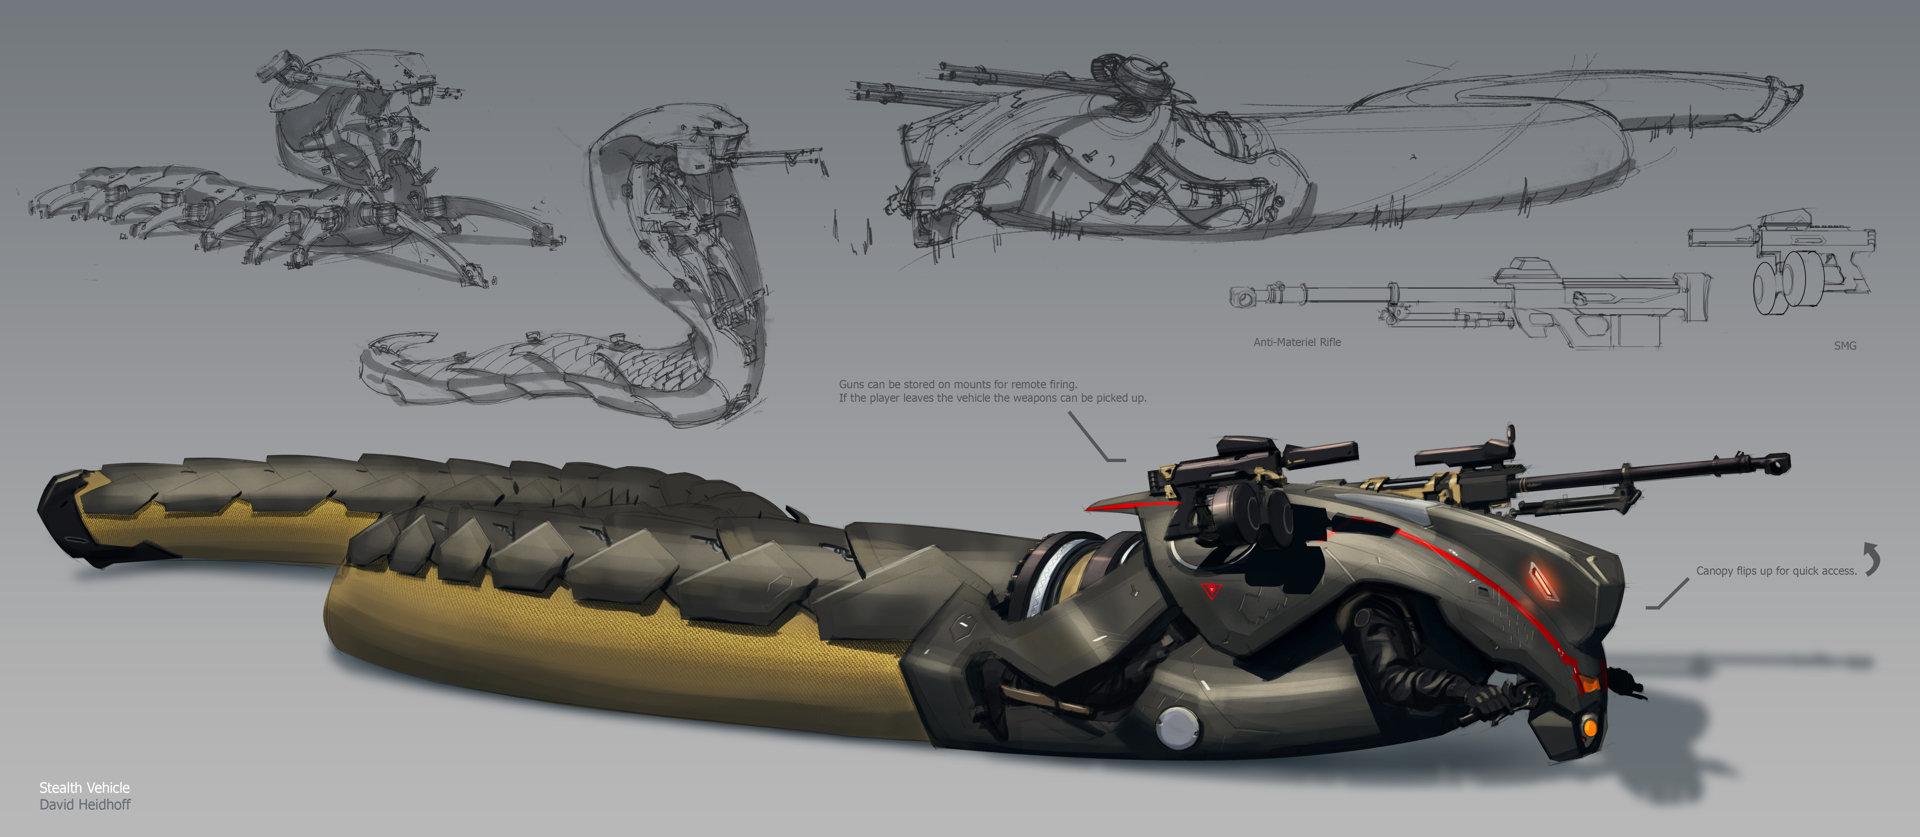 Sci Fi Vehicle Concept Art